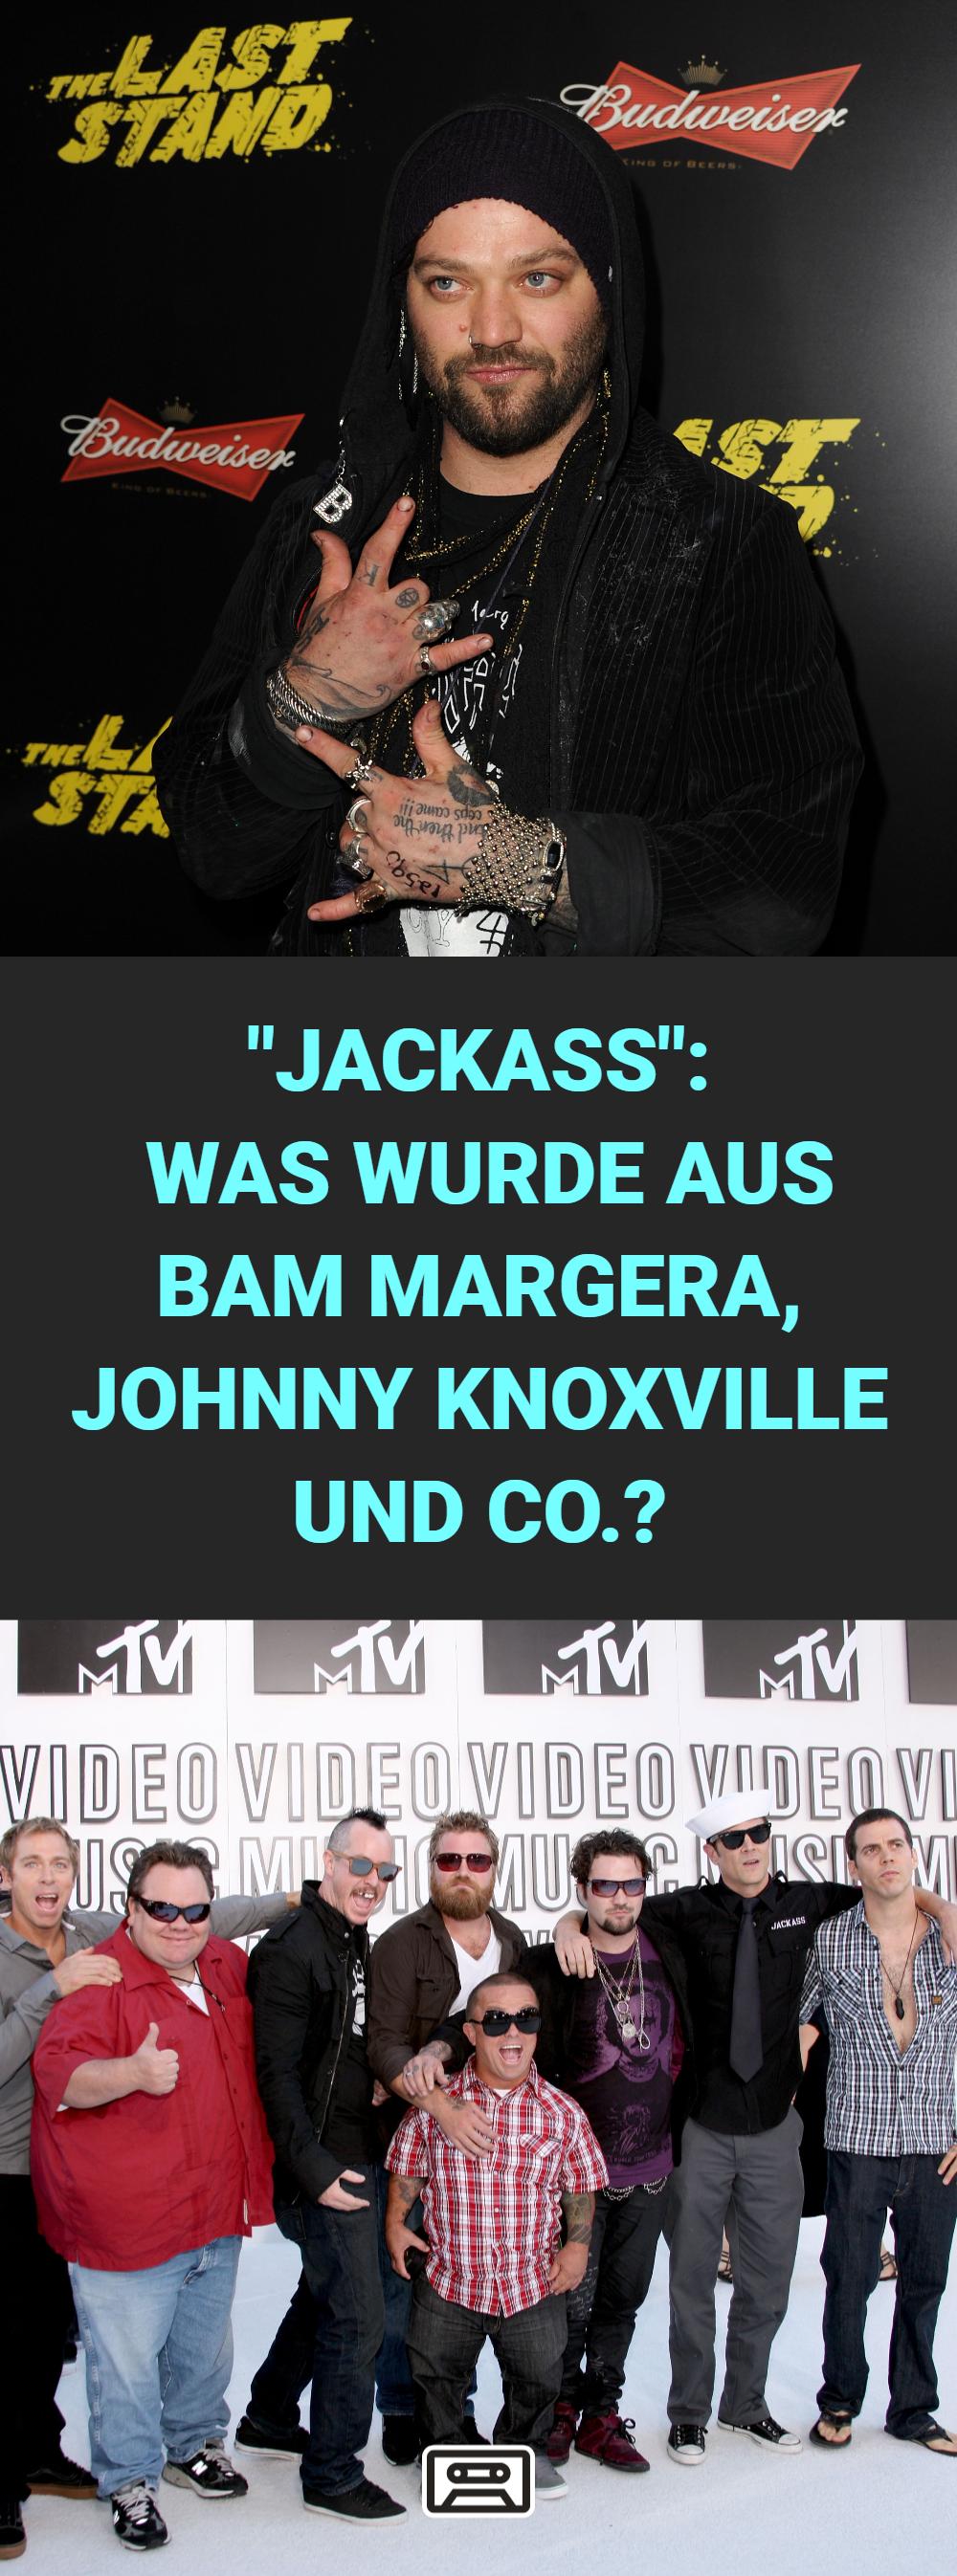 Jackass Darsteller